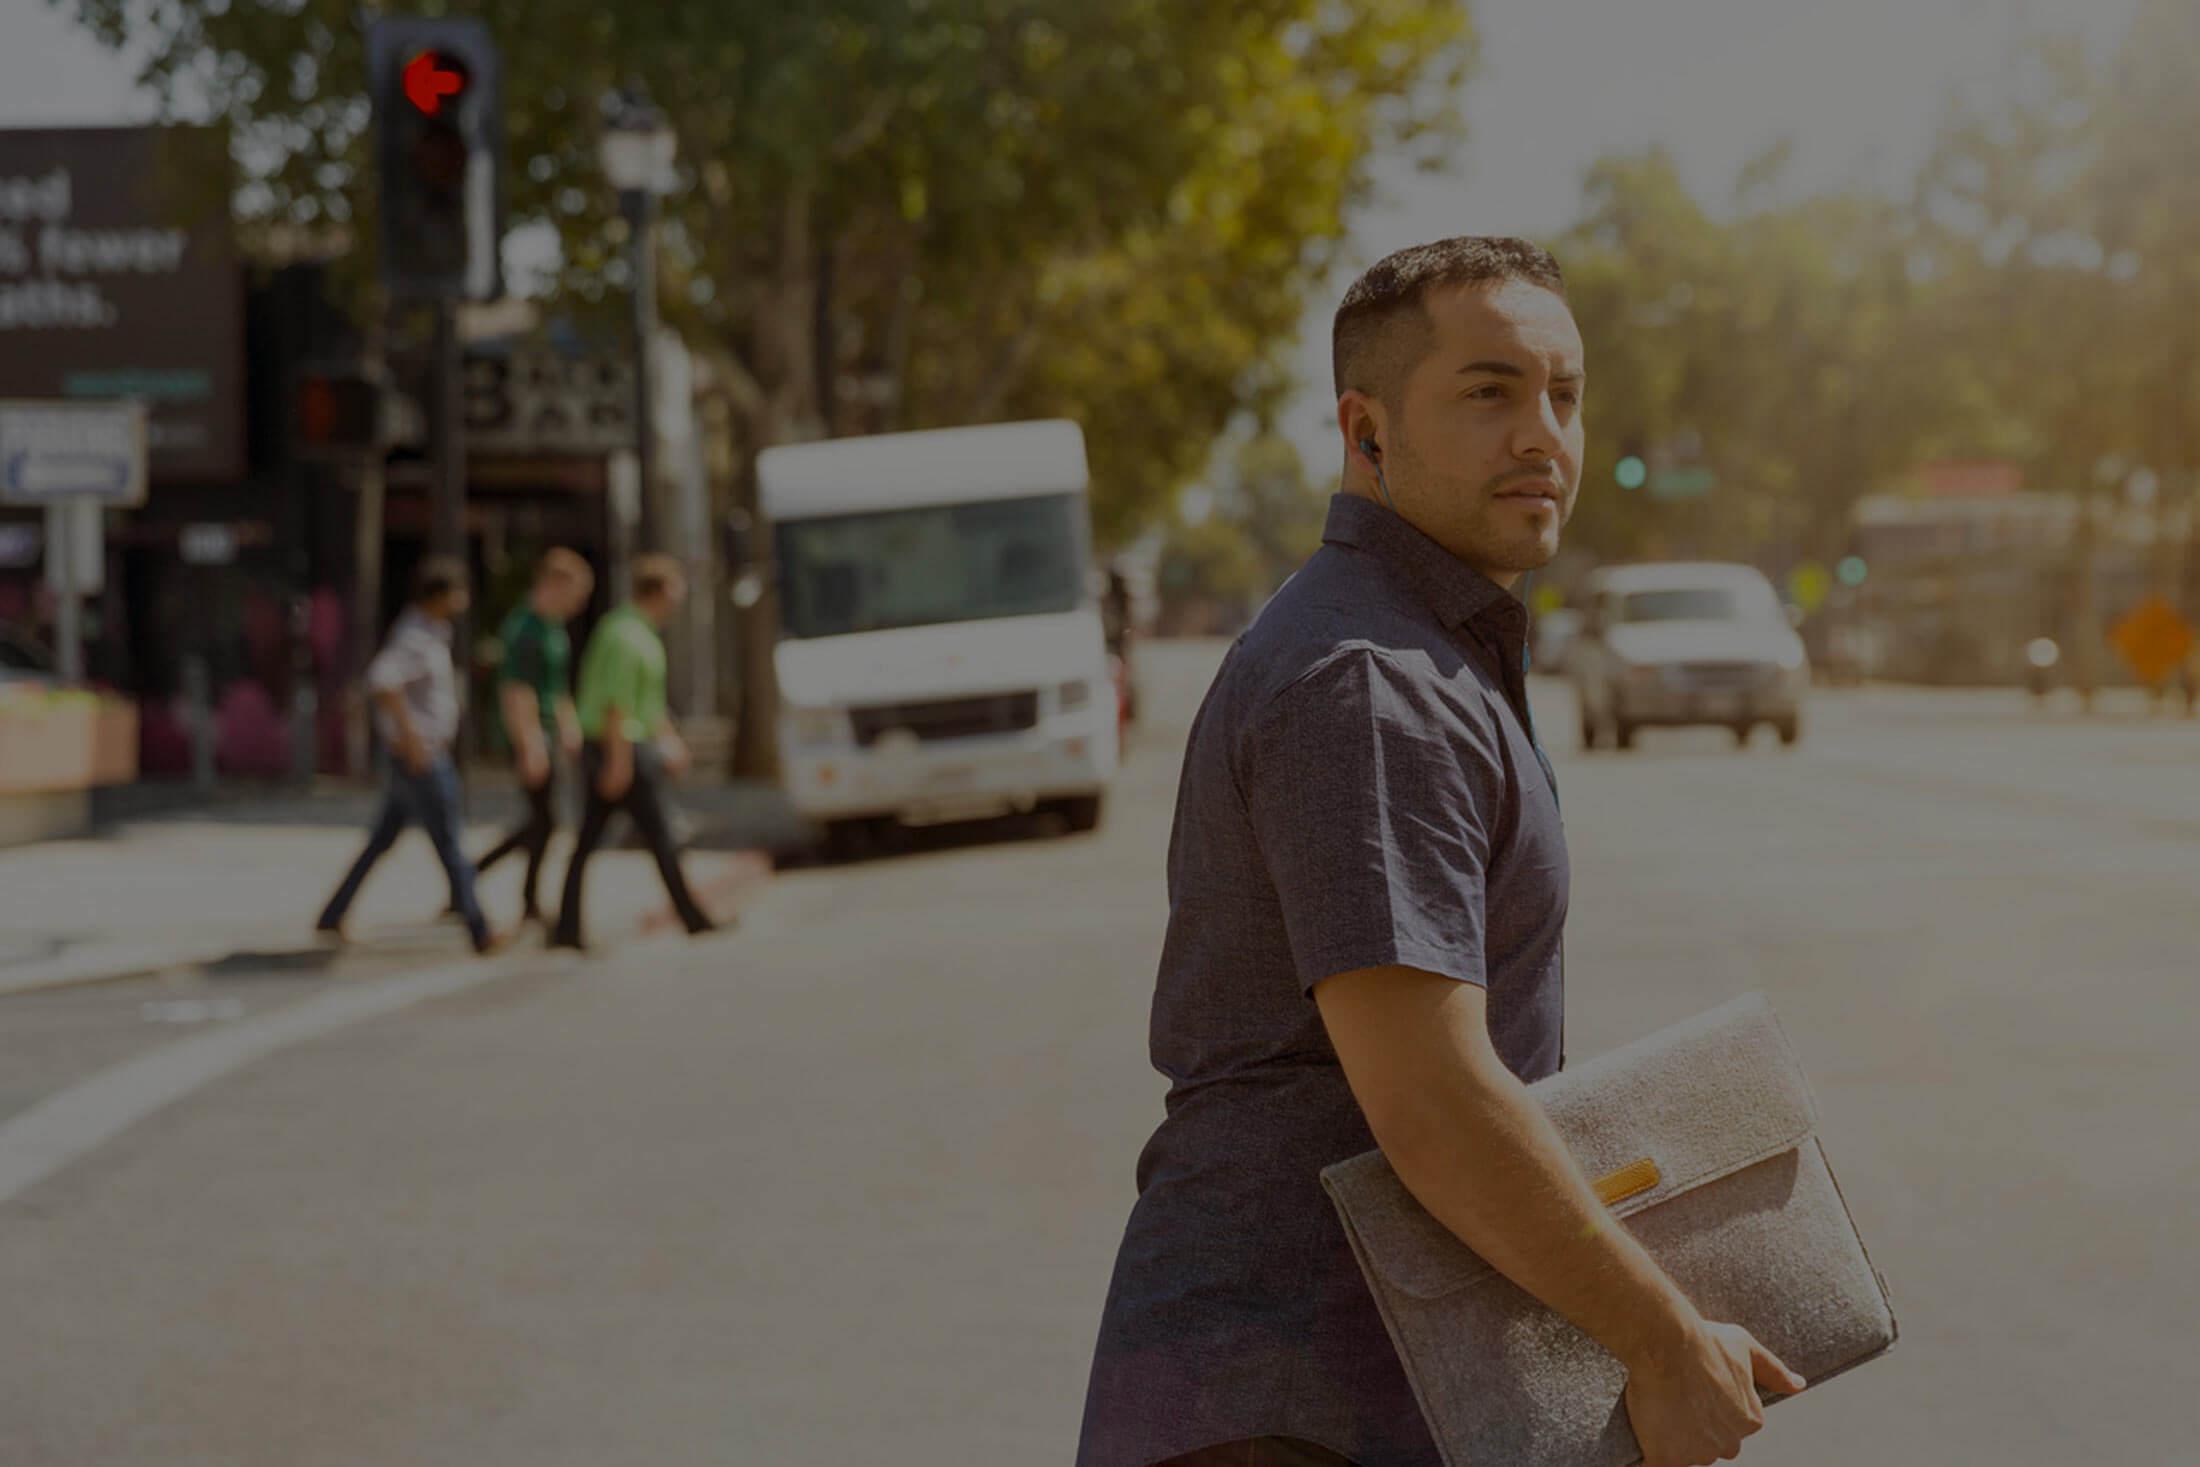 Pole emploi - offre emploi Assistant adv (H/F) - Saint-Philbert-De-Grand-Lieu